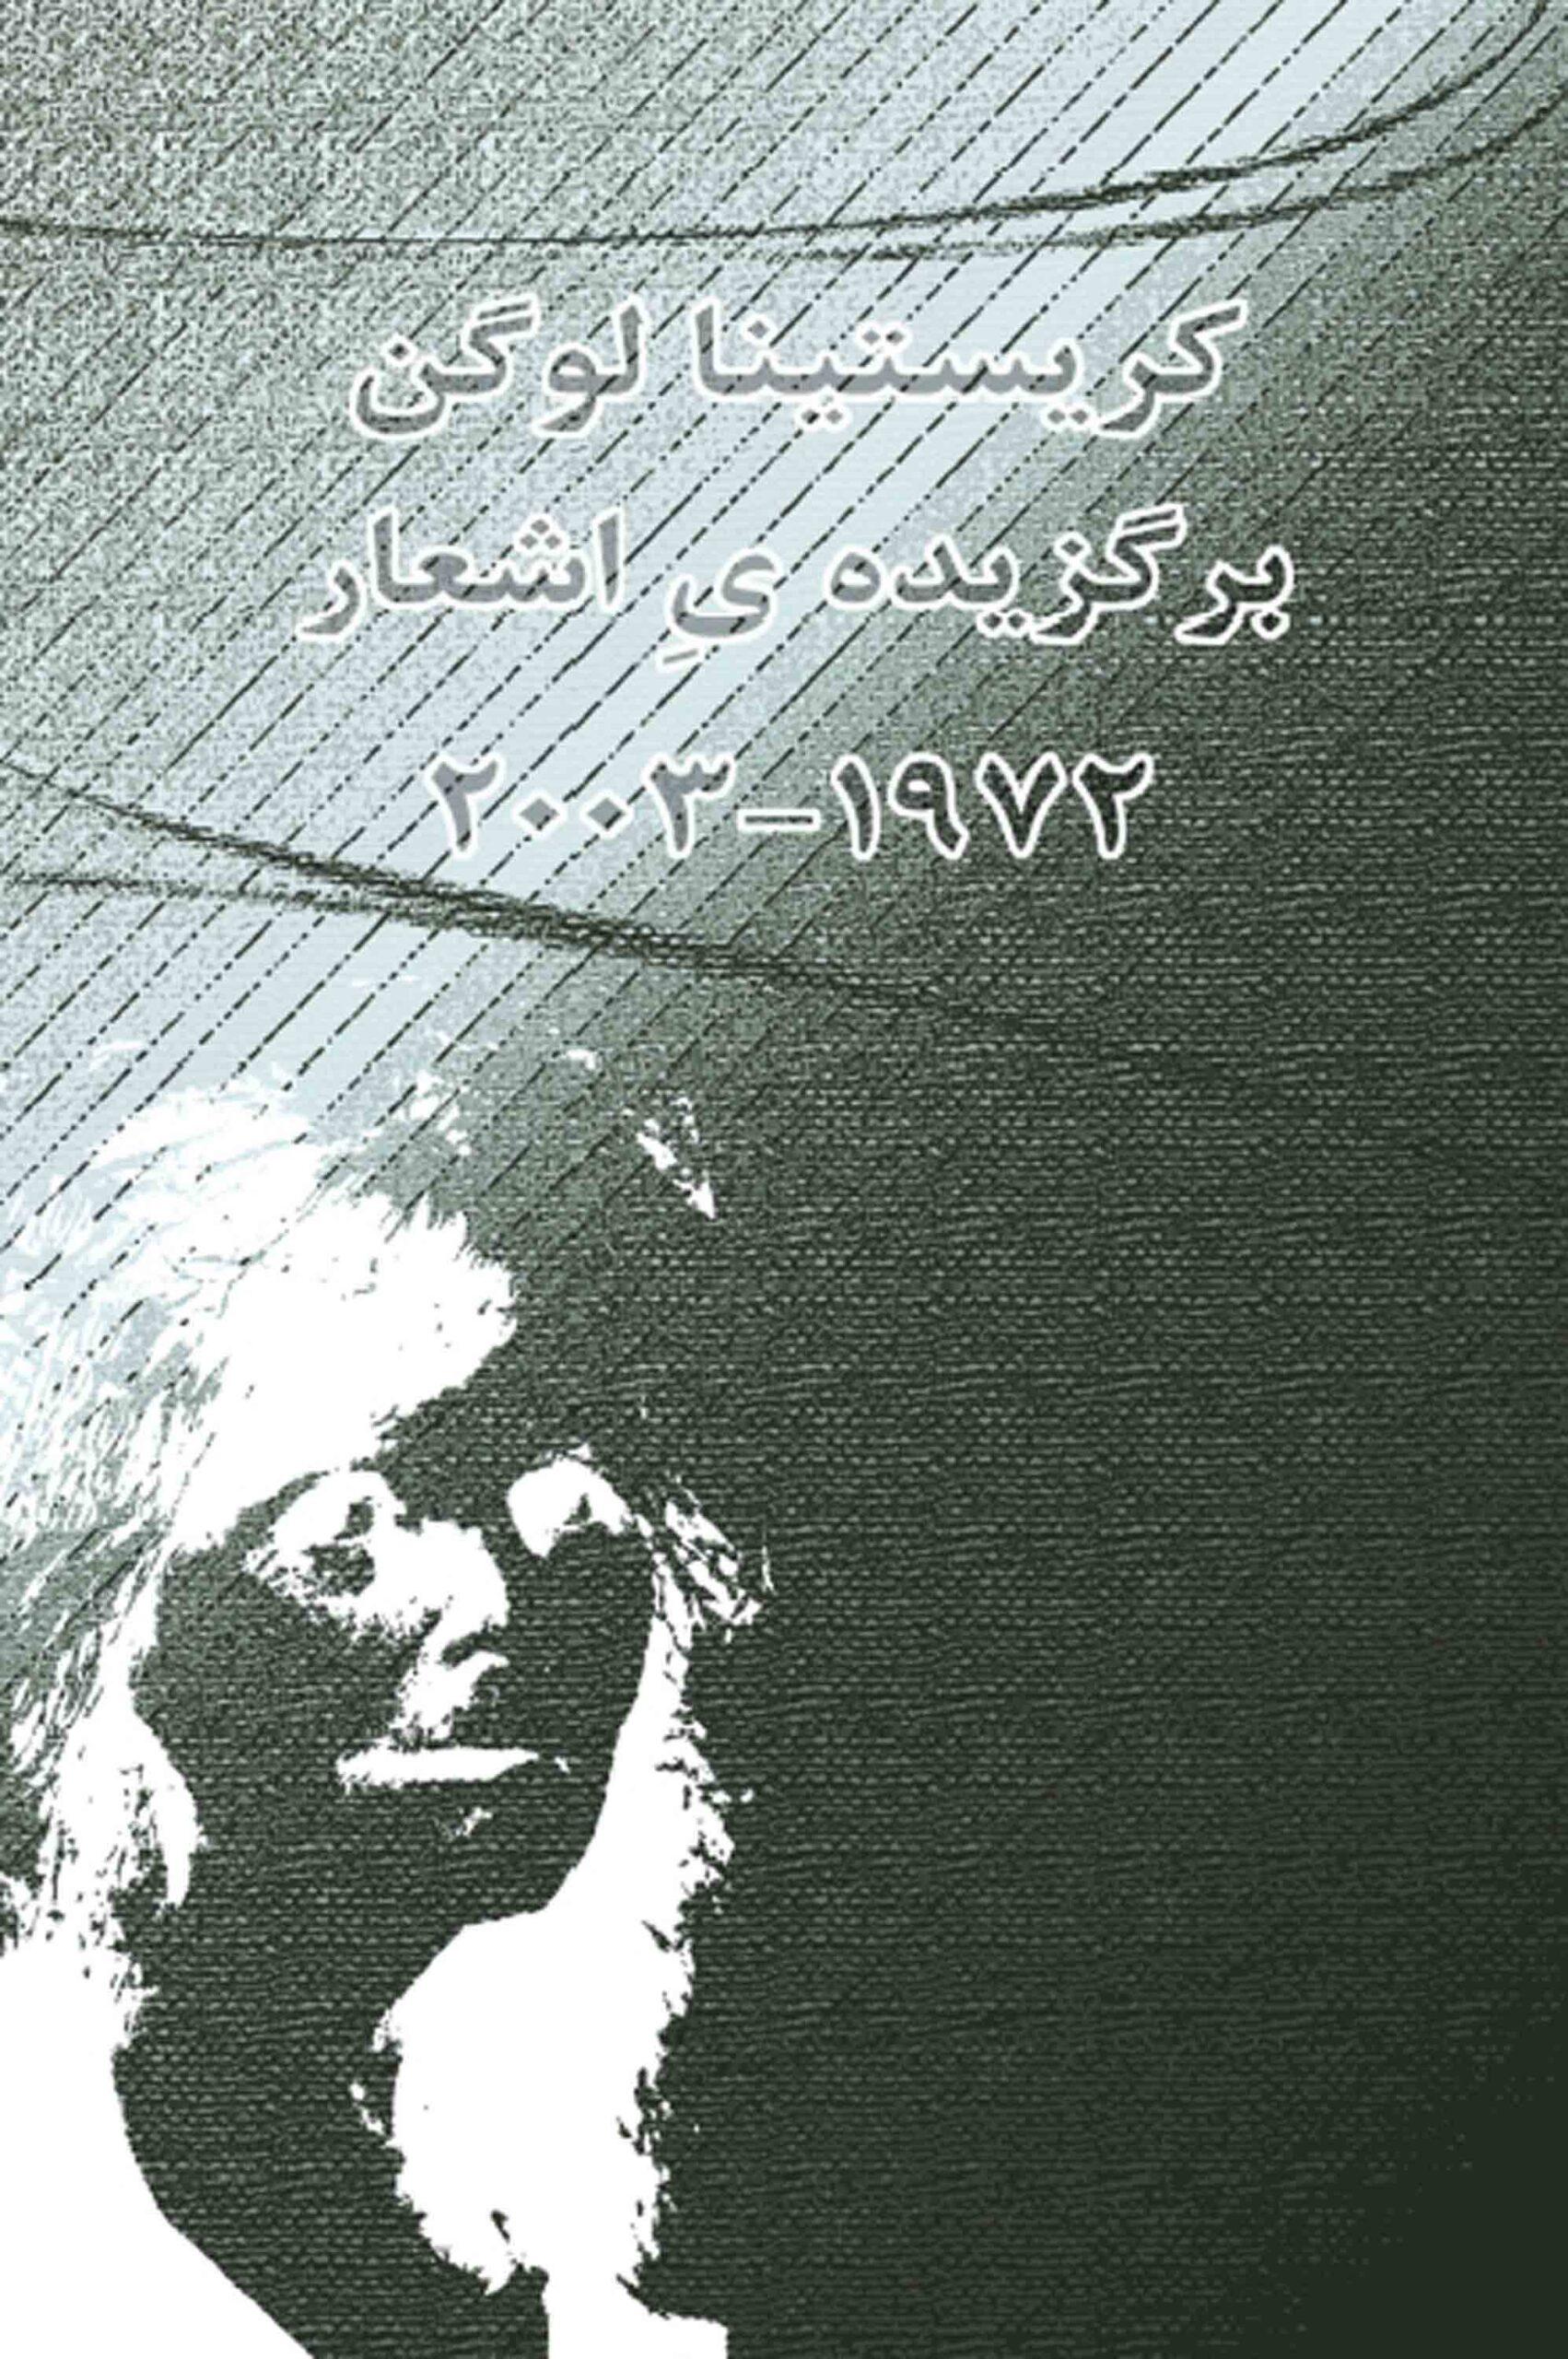 Selected poems (1979-2003) – bàrgozidehye àsh'are Kristina Lugn